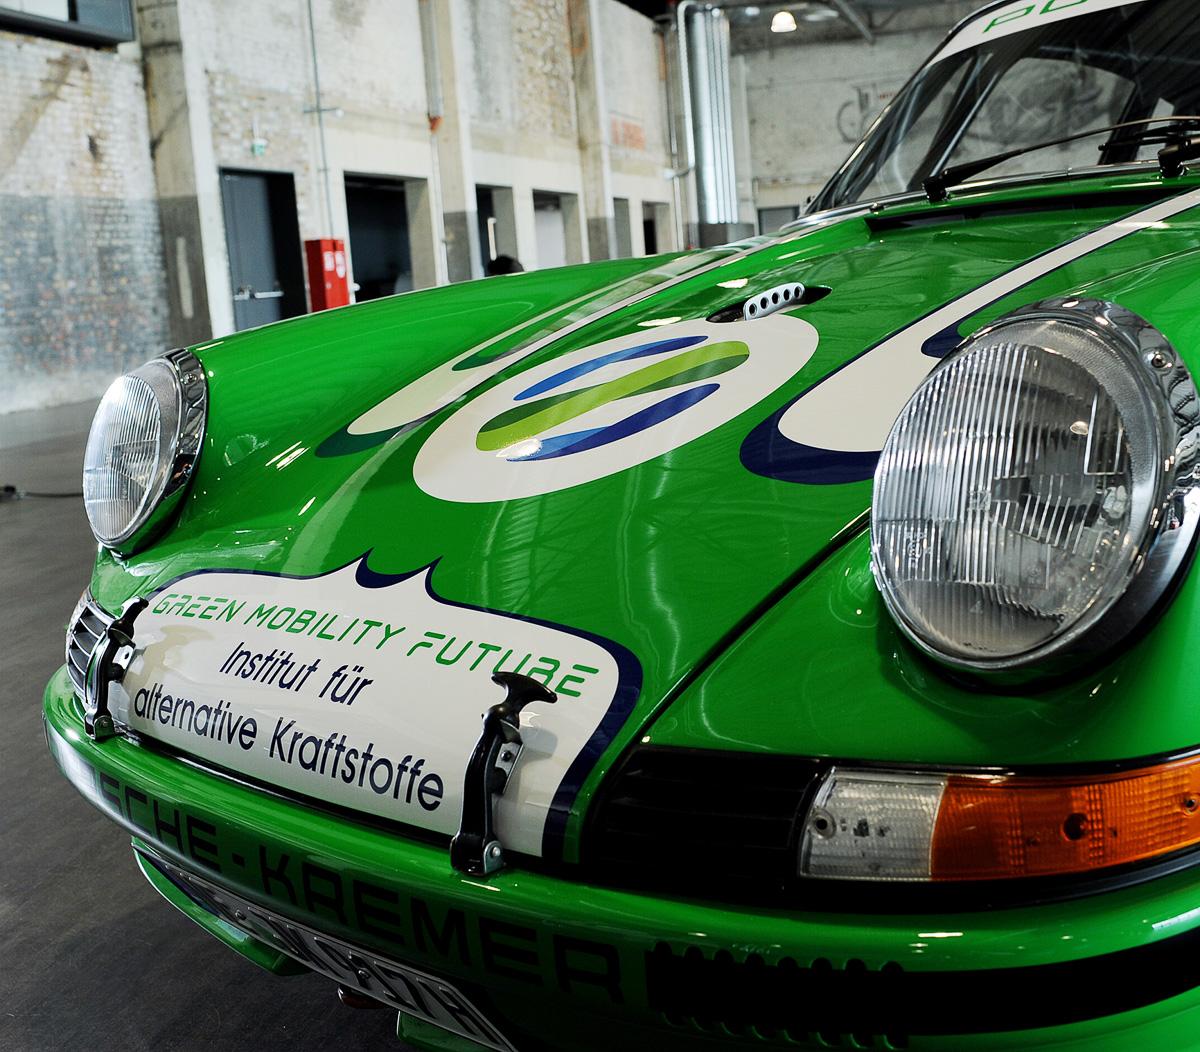 Green Mobility Fuuture E-Fuels